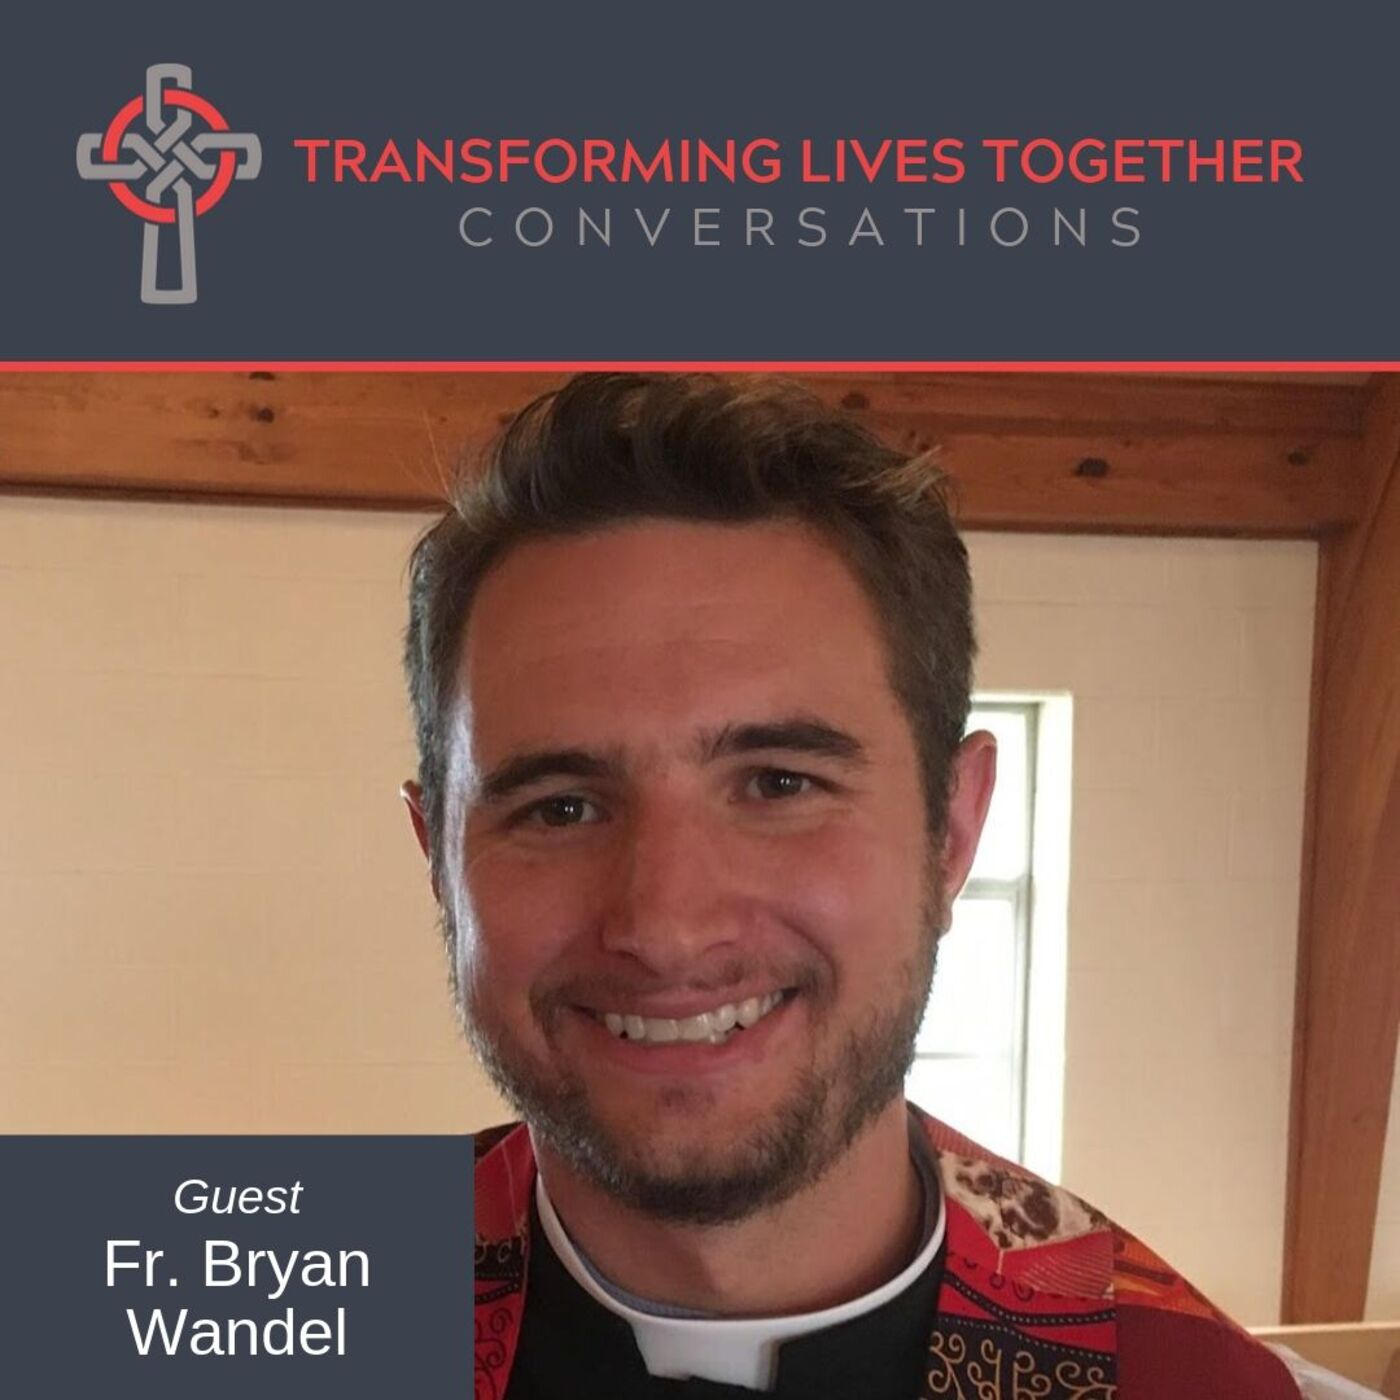 Conversations: Fr. Bryan Wandel